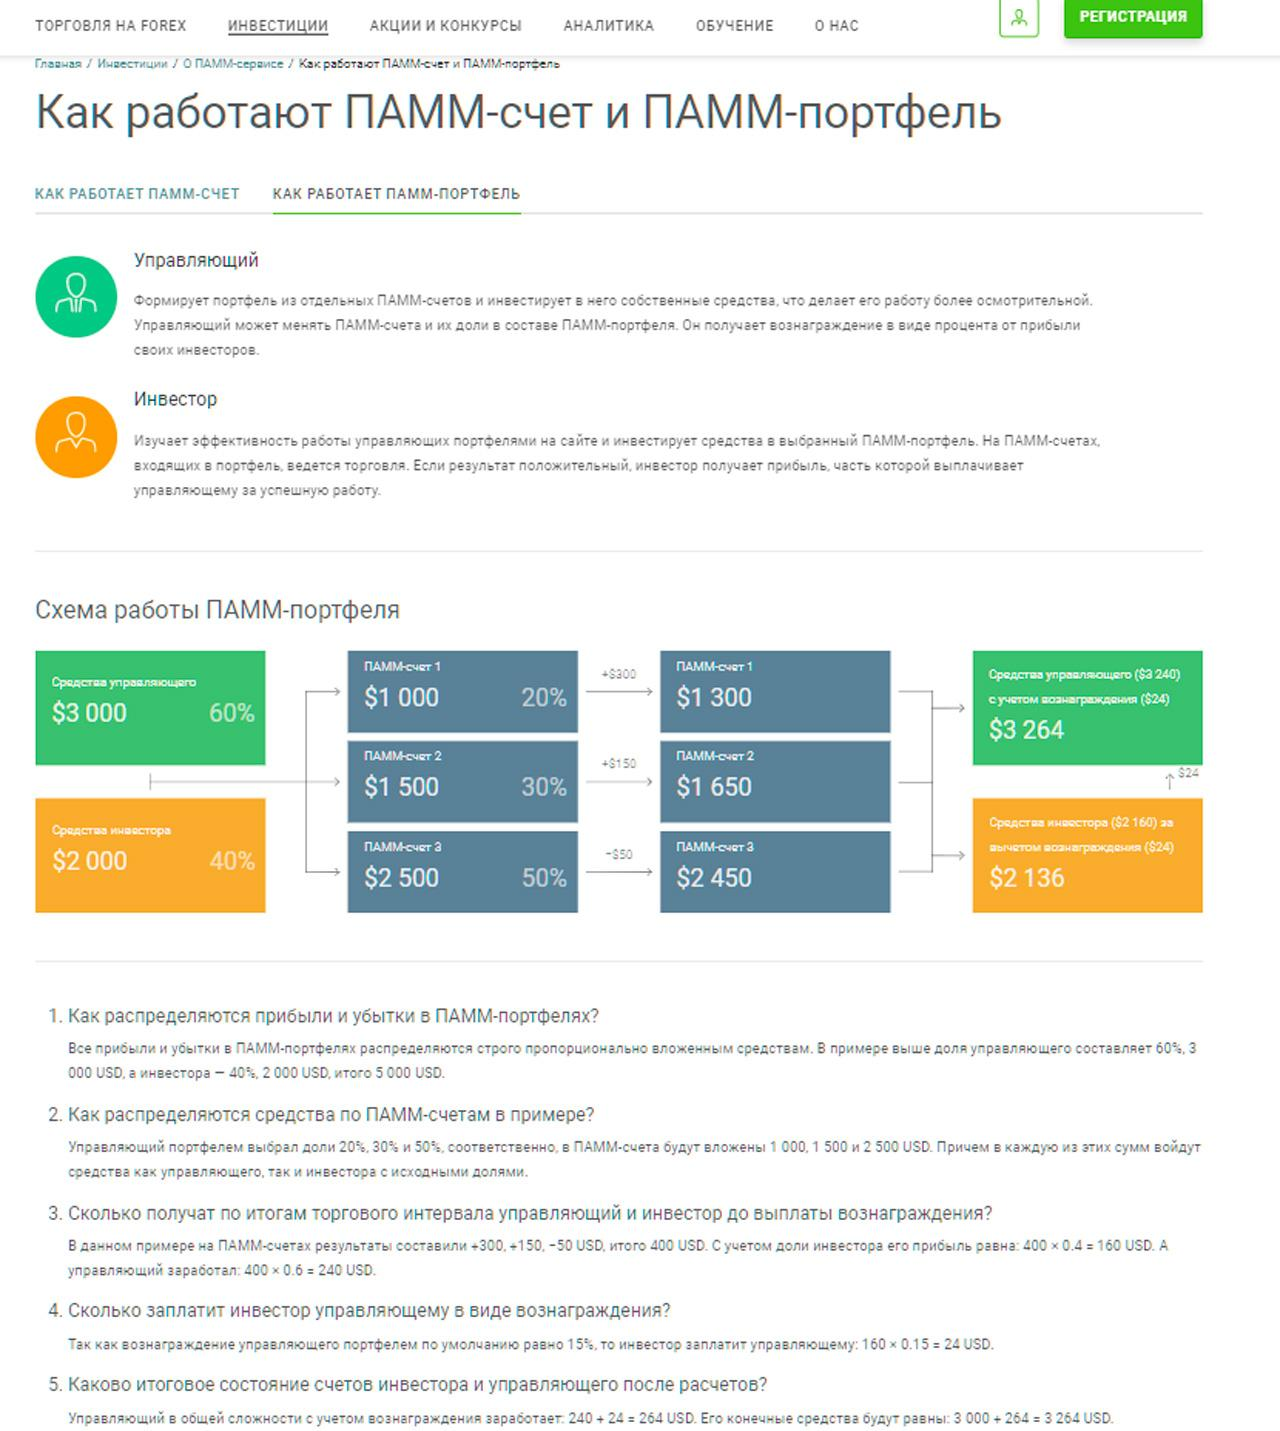 Презентация по схеме работы ПАММ-счета и ПАММ-портфеля